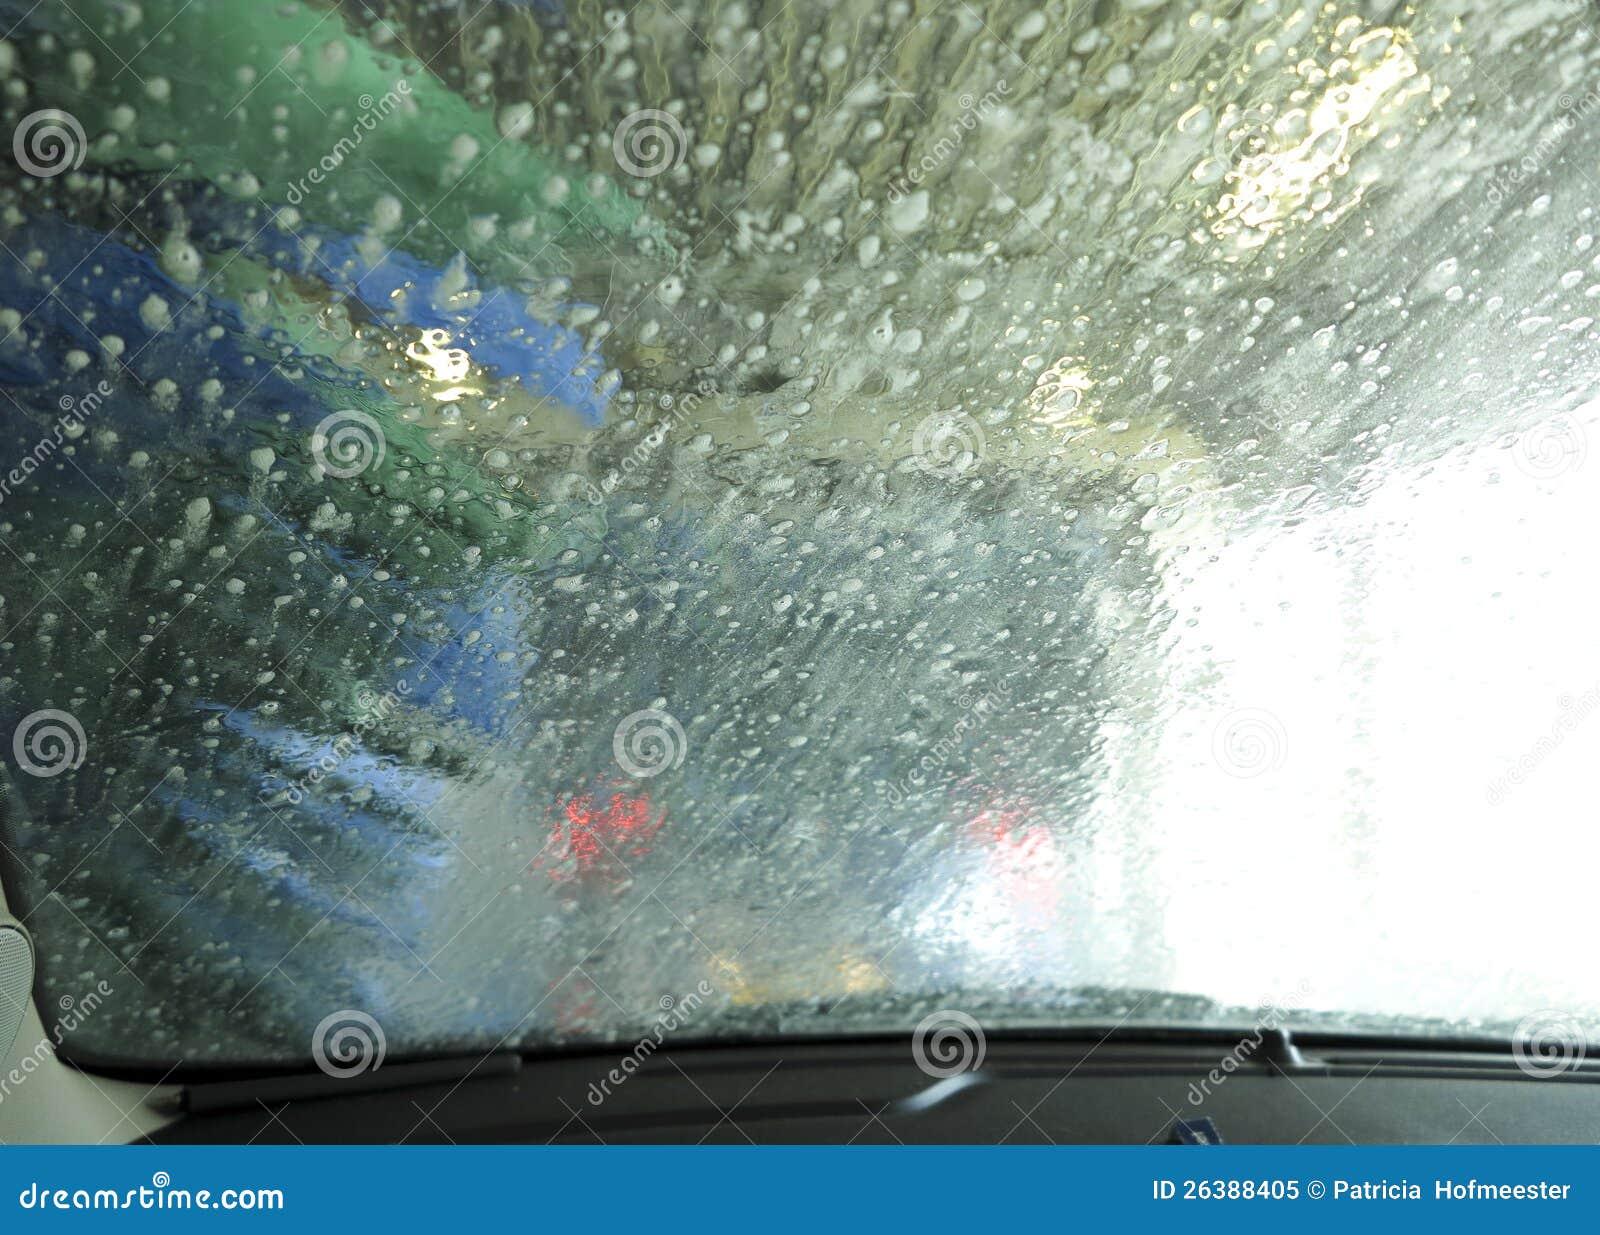 inside the car wash royalty free stock photo image 26388405. Black Bedroom Furniture Sets. Home Design Ideas